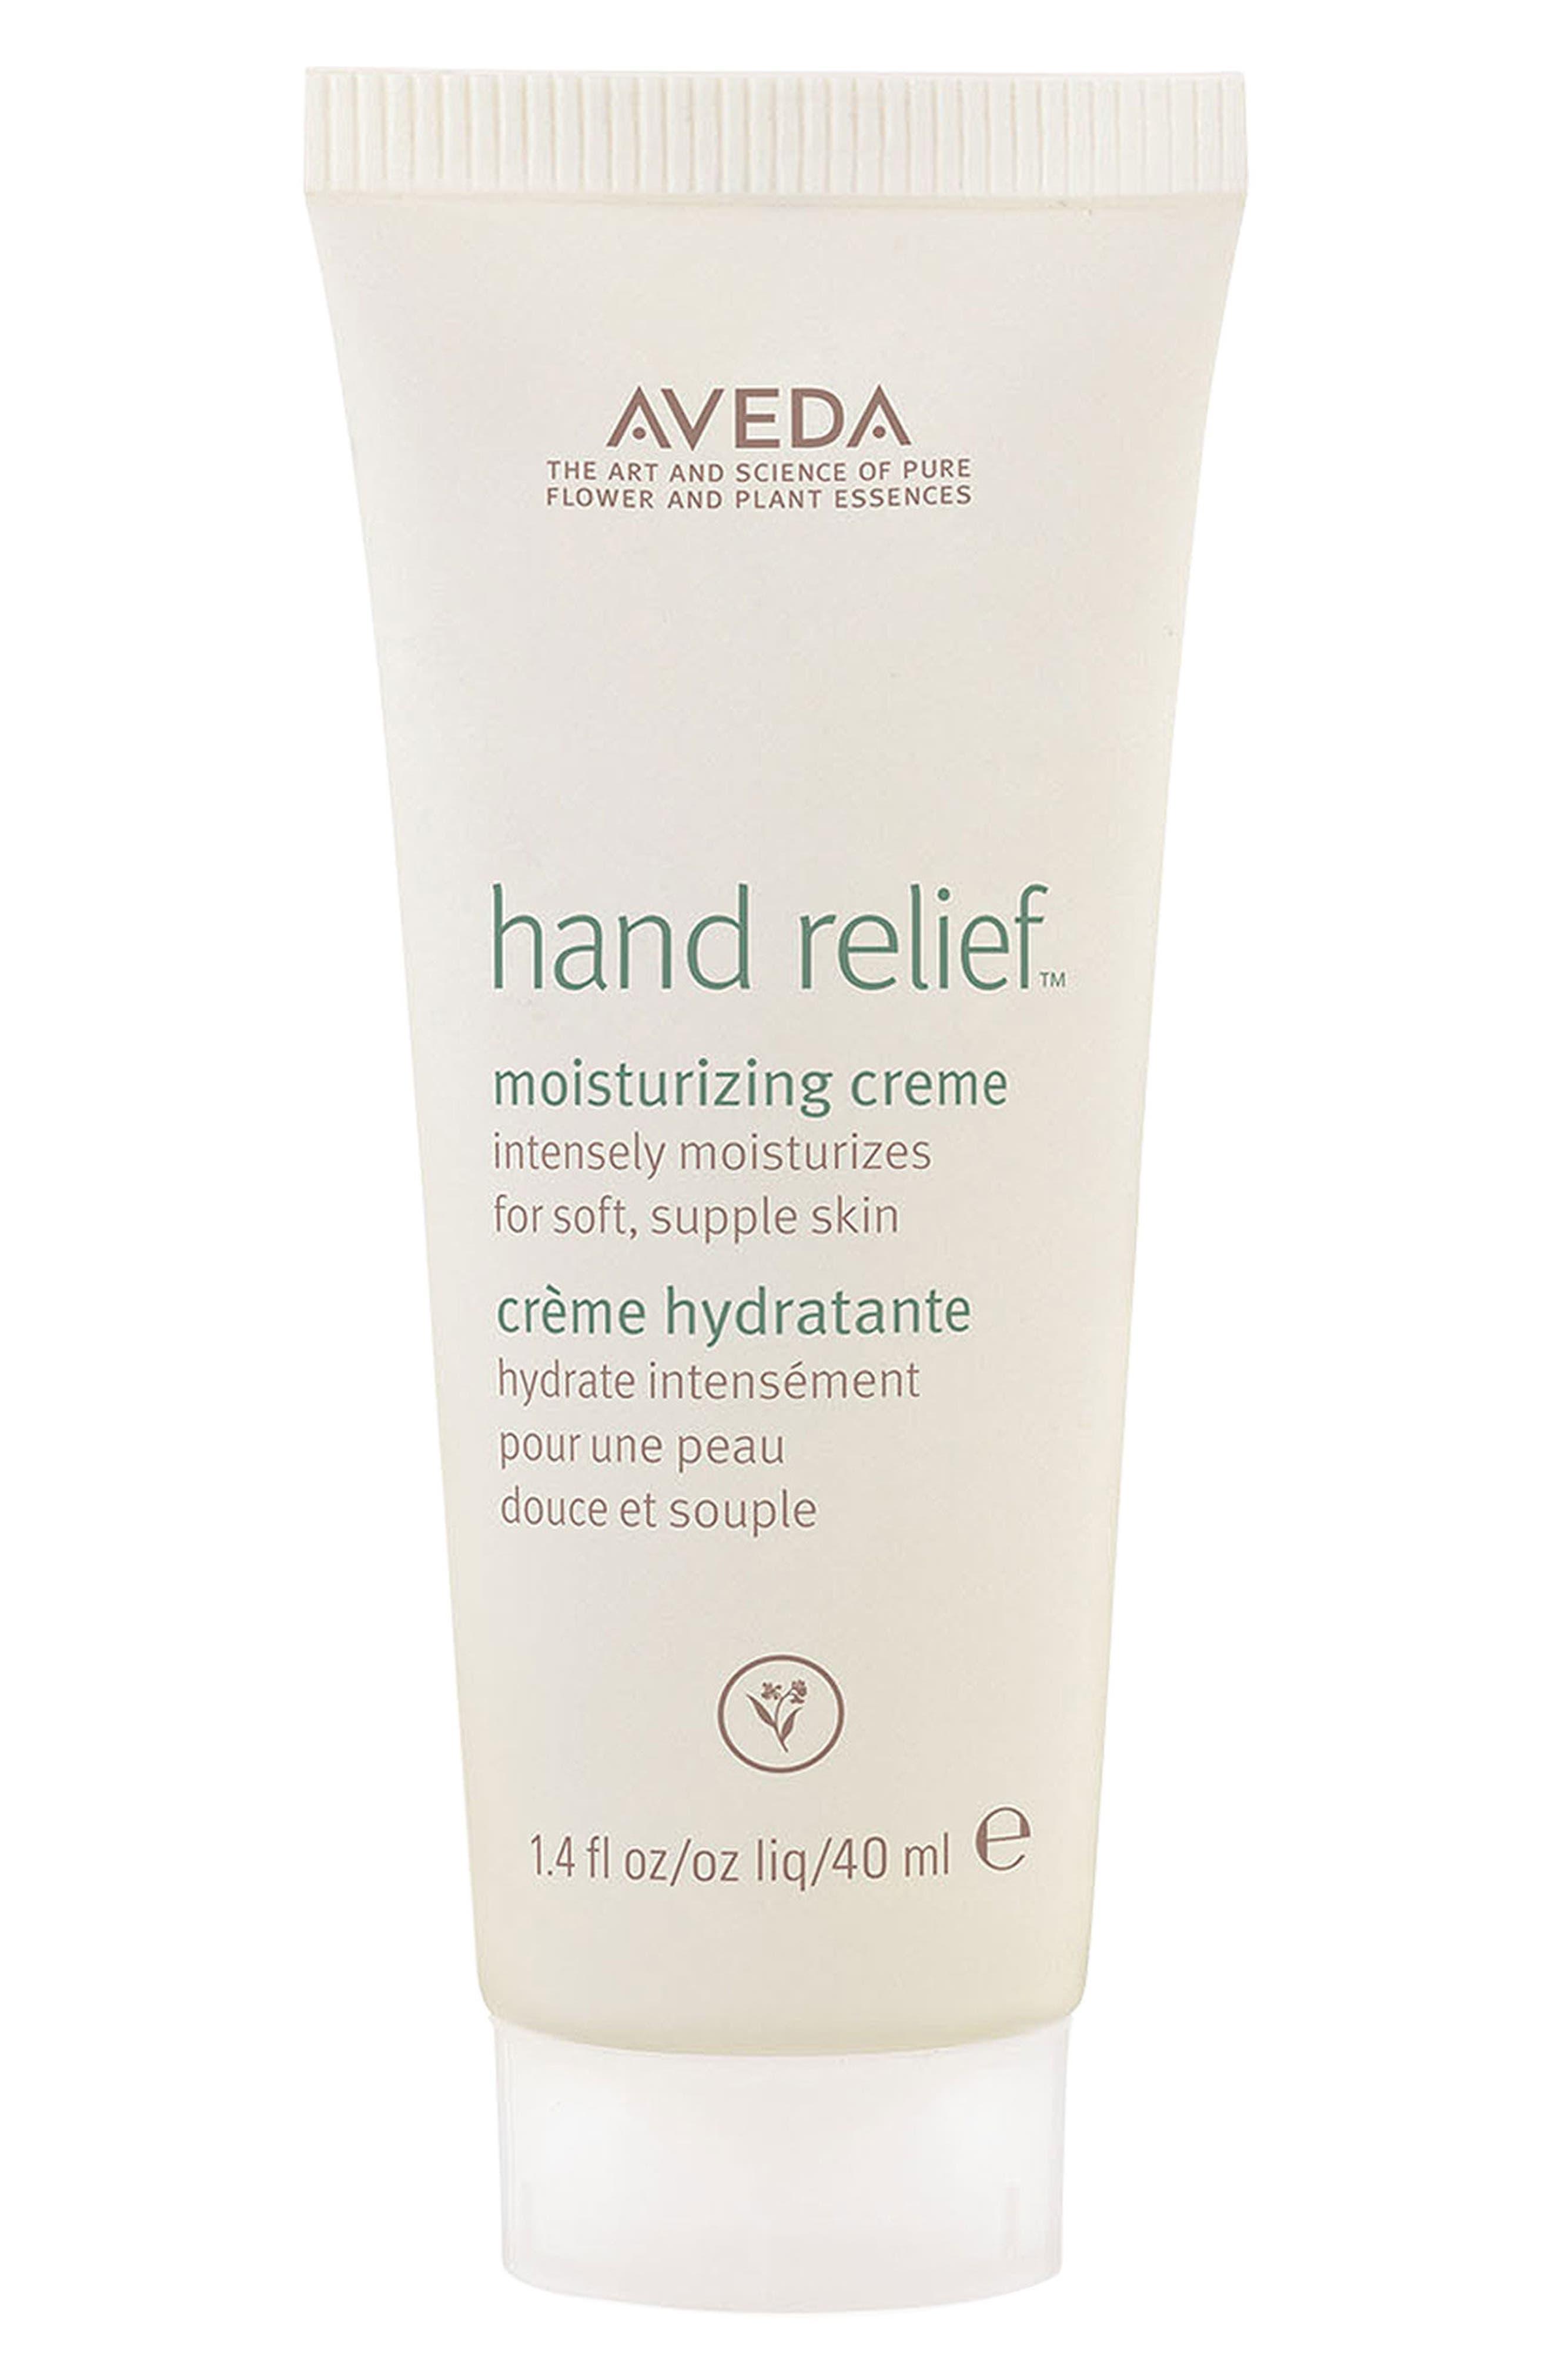 Aveda 'hand relief™' Hand Cream